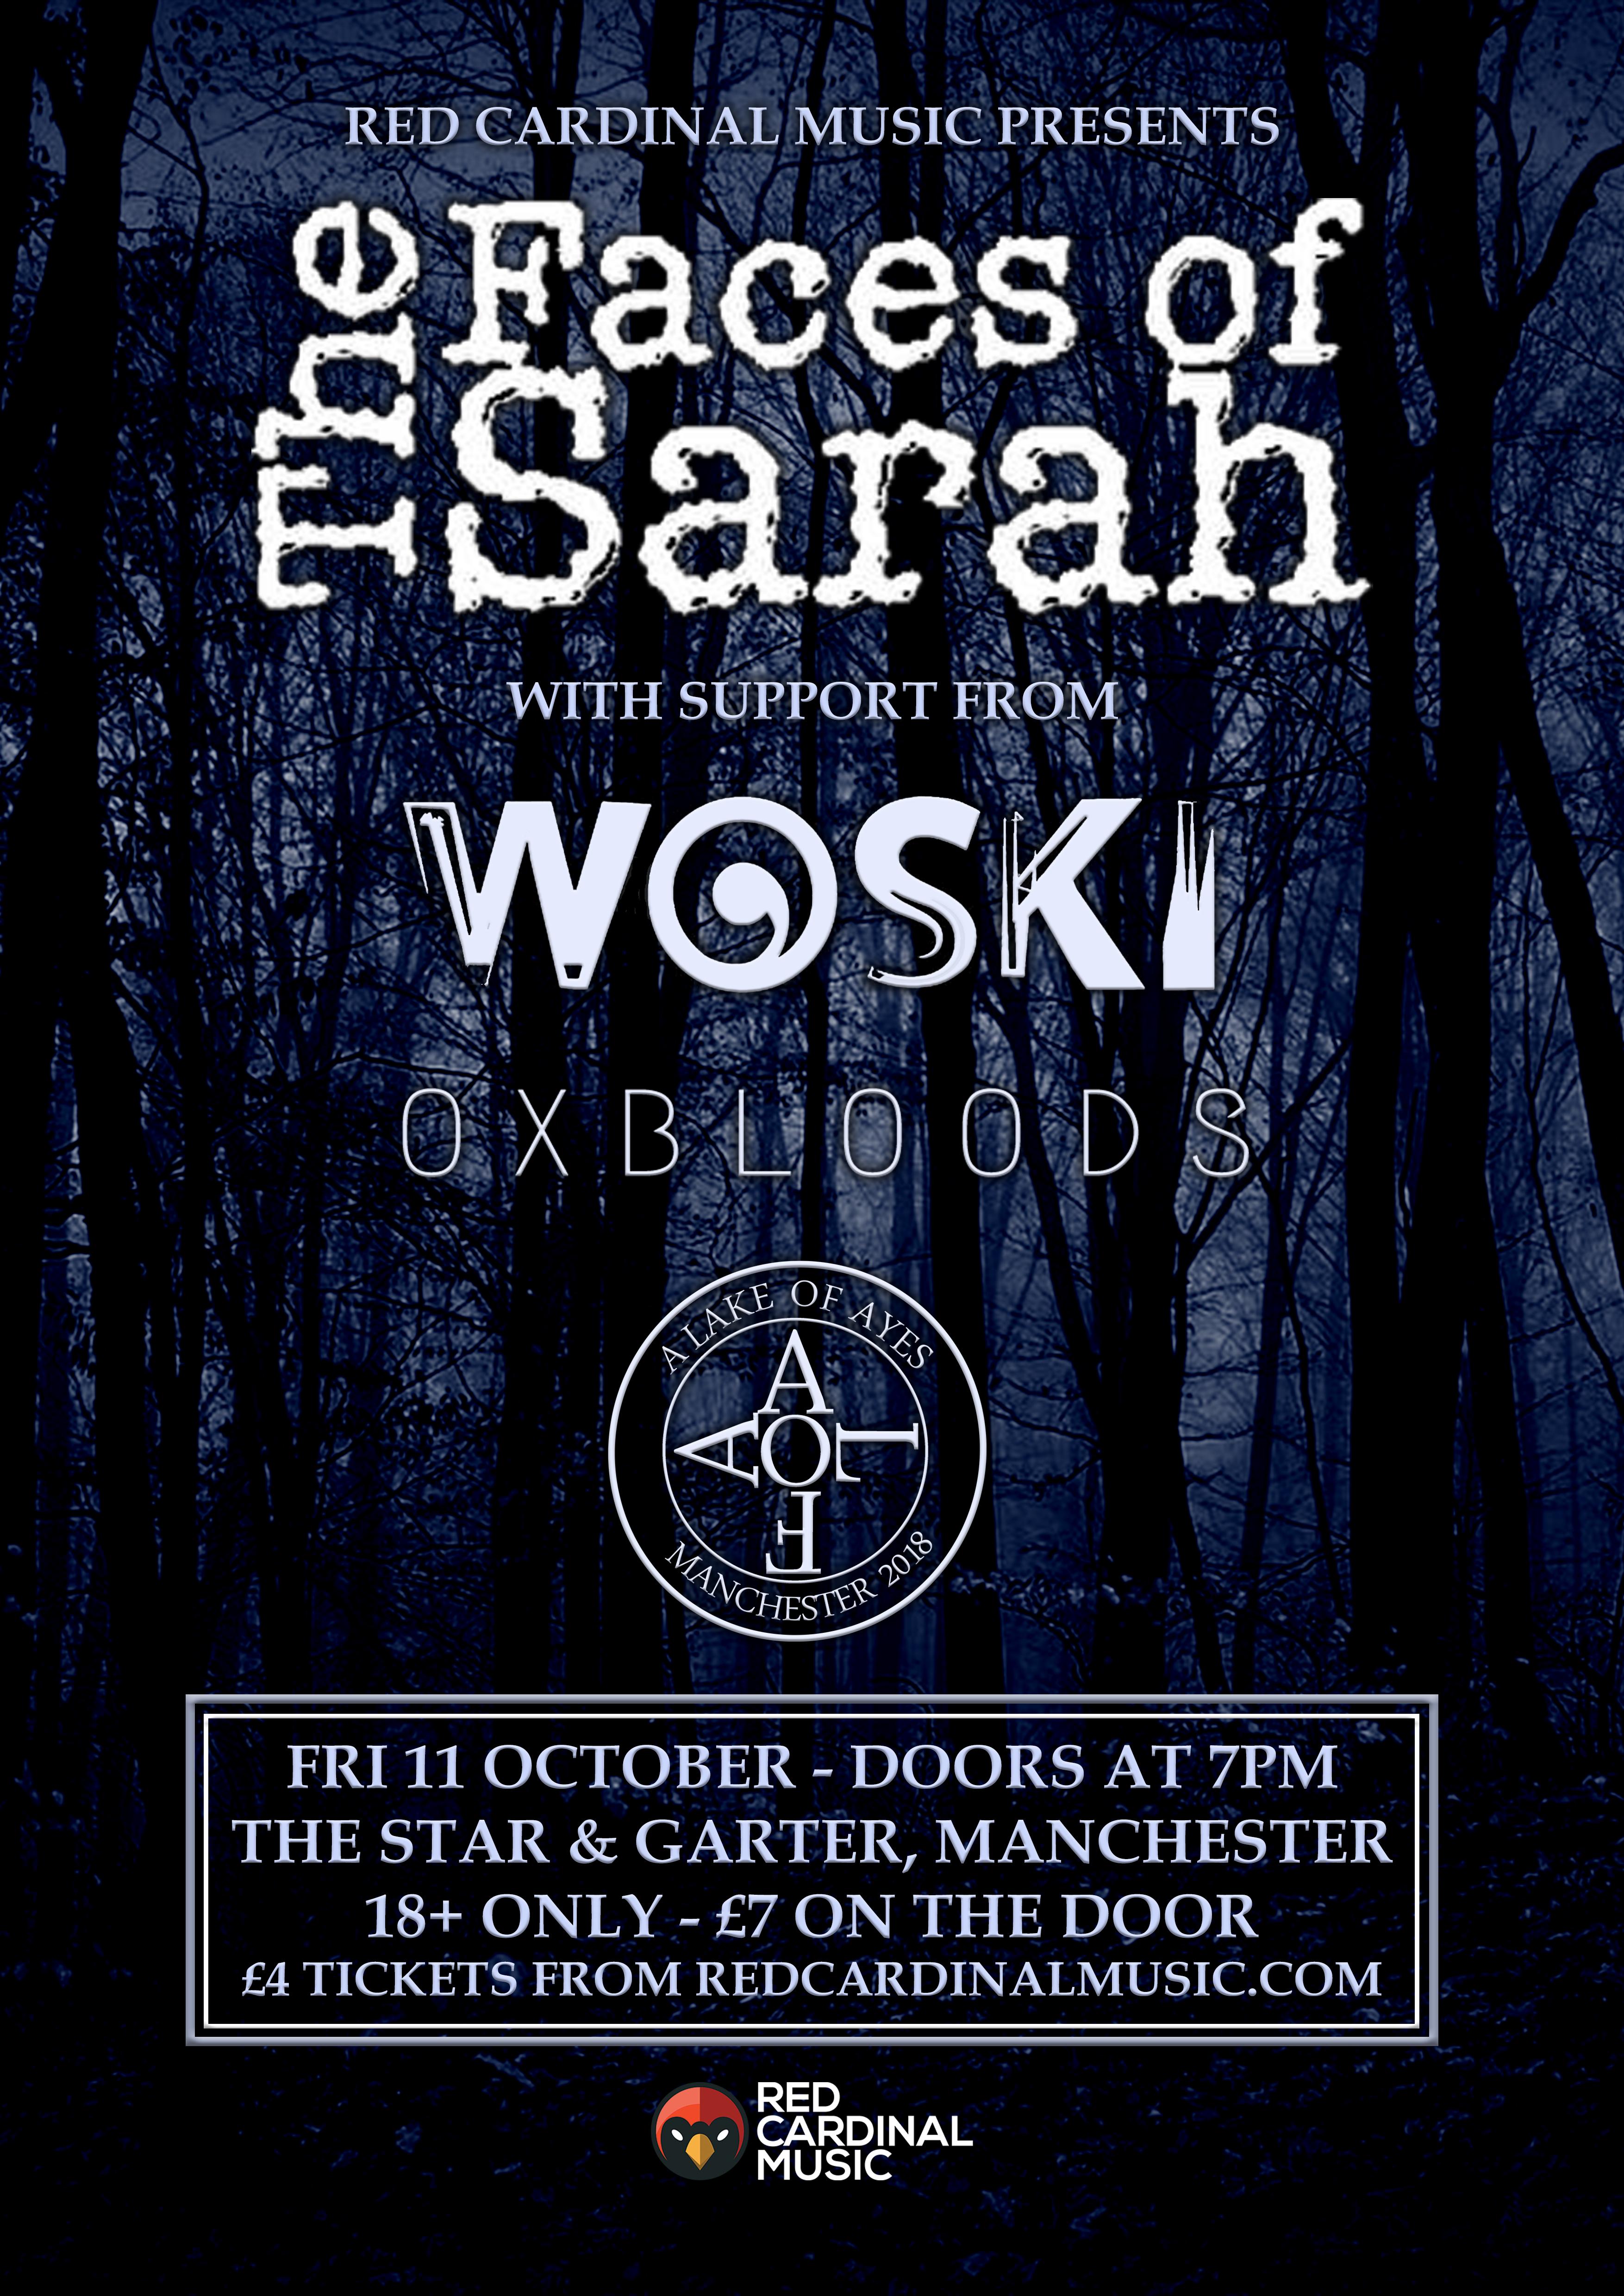 The Faces of Sarah at Star & Garter - Oct 19 - Red Cardinal Music - Manchester